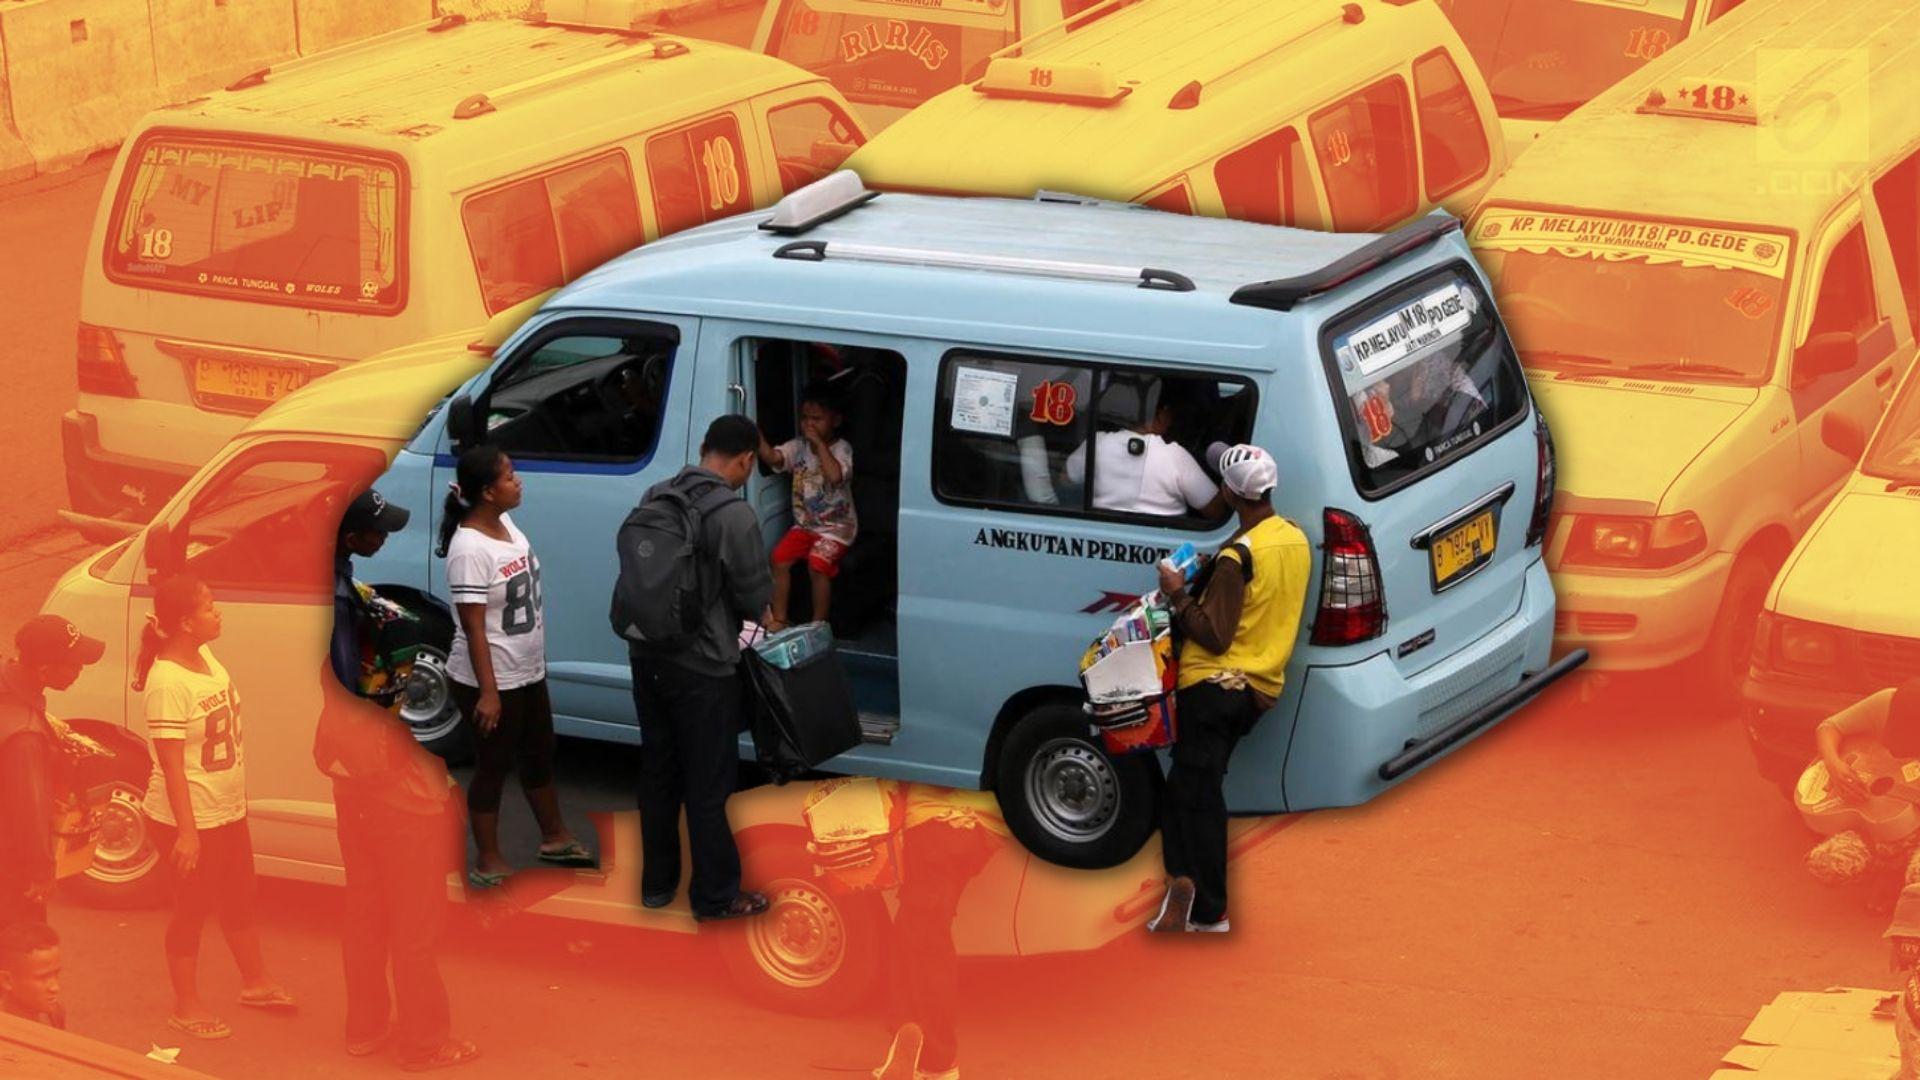 Angkot di Jakarta Udah Nggak Bikin Macet Gara-Gara Ngetem, Begini Kata Anies Baswedan